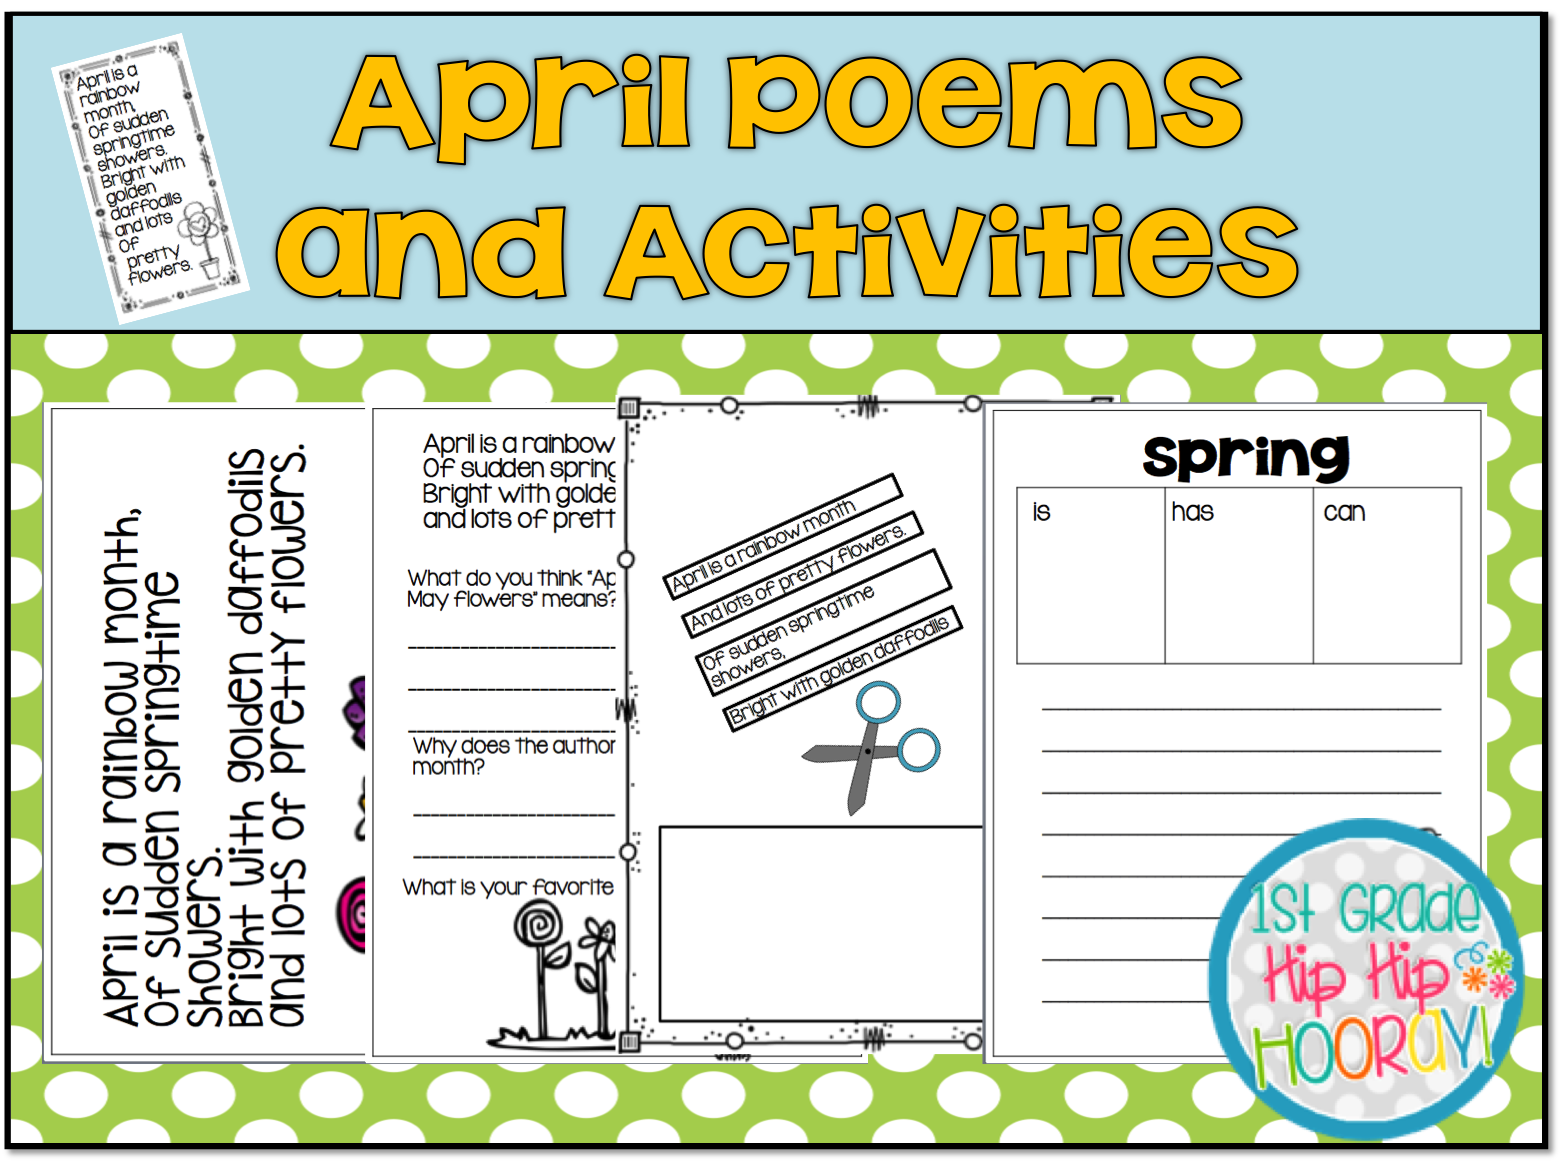 1st Grade Hip Hip Hooray April Poetry Ad Write